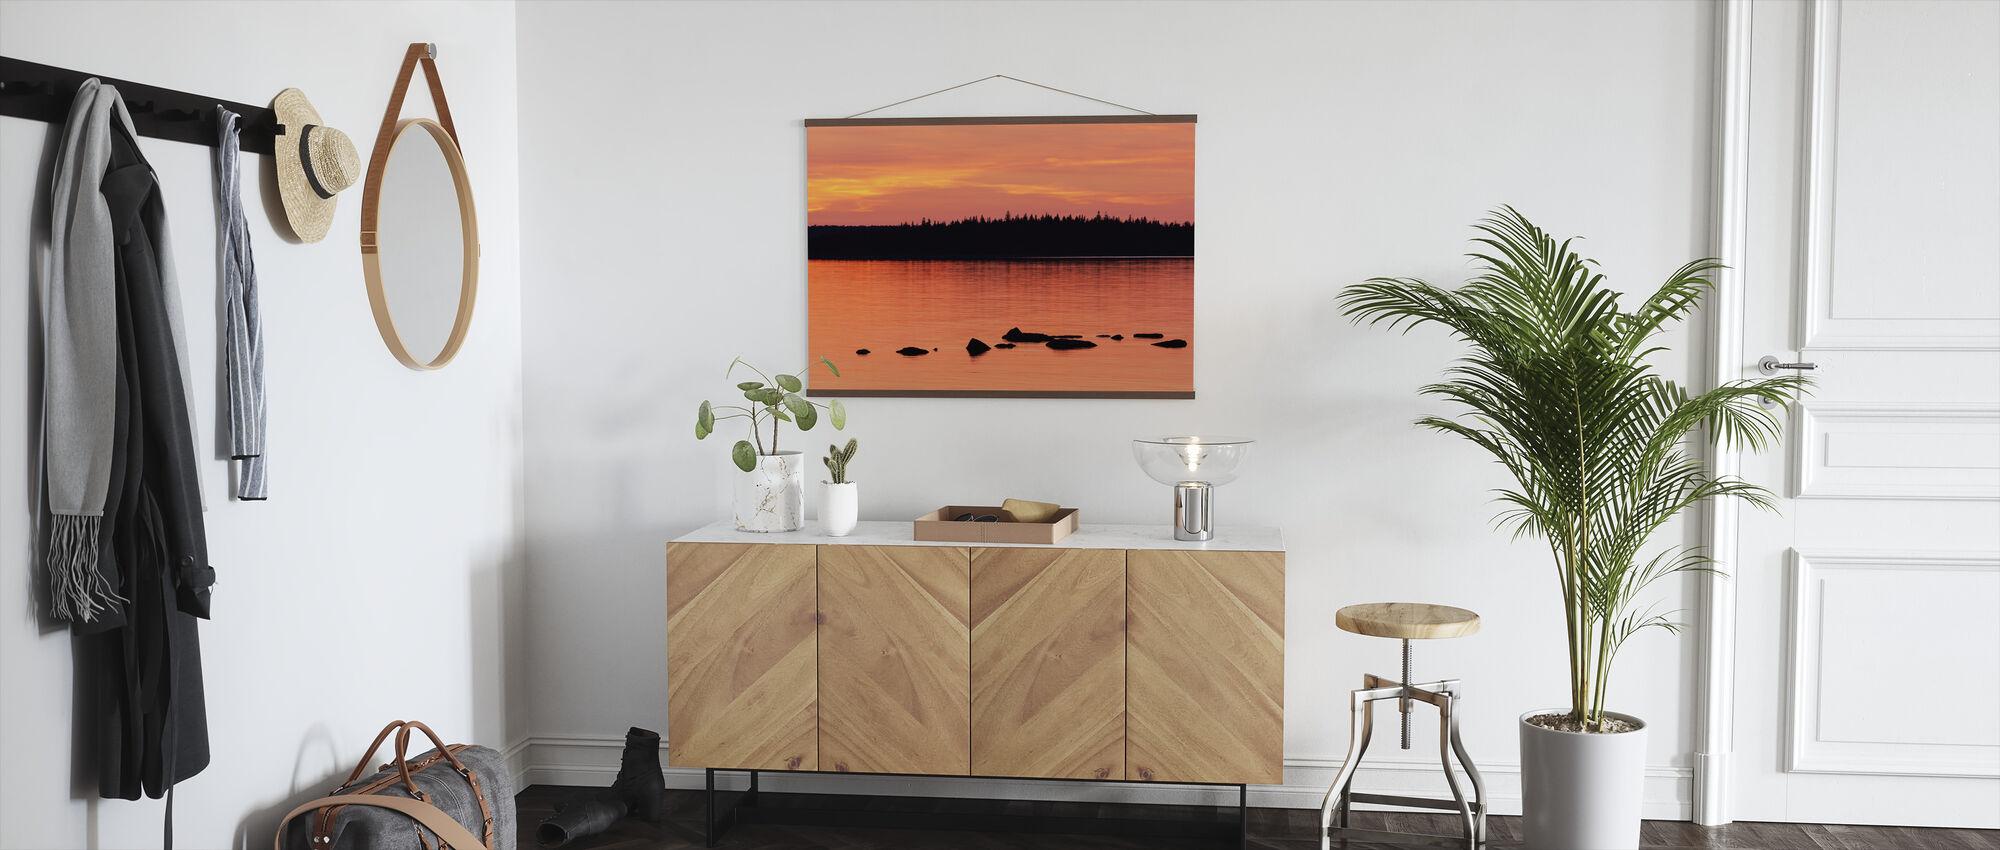 Sundown, Gotland - Poster - Hallway